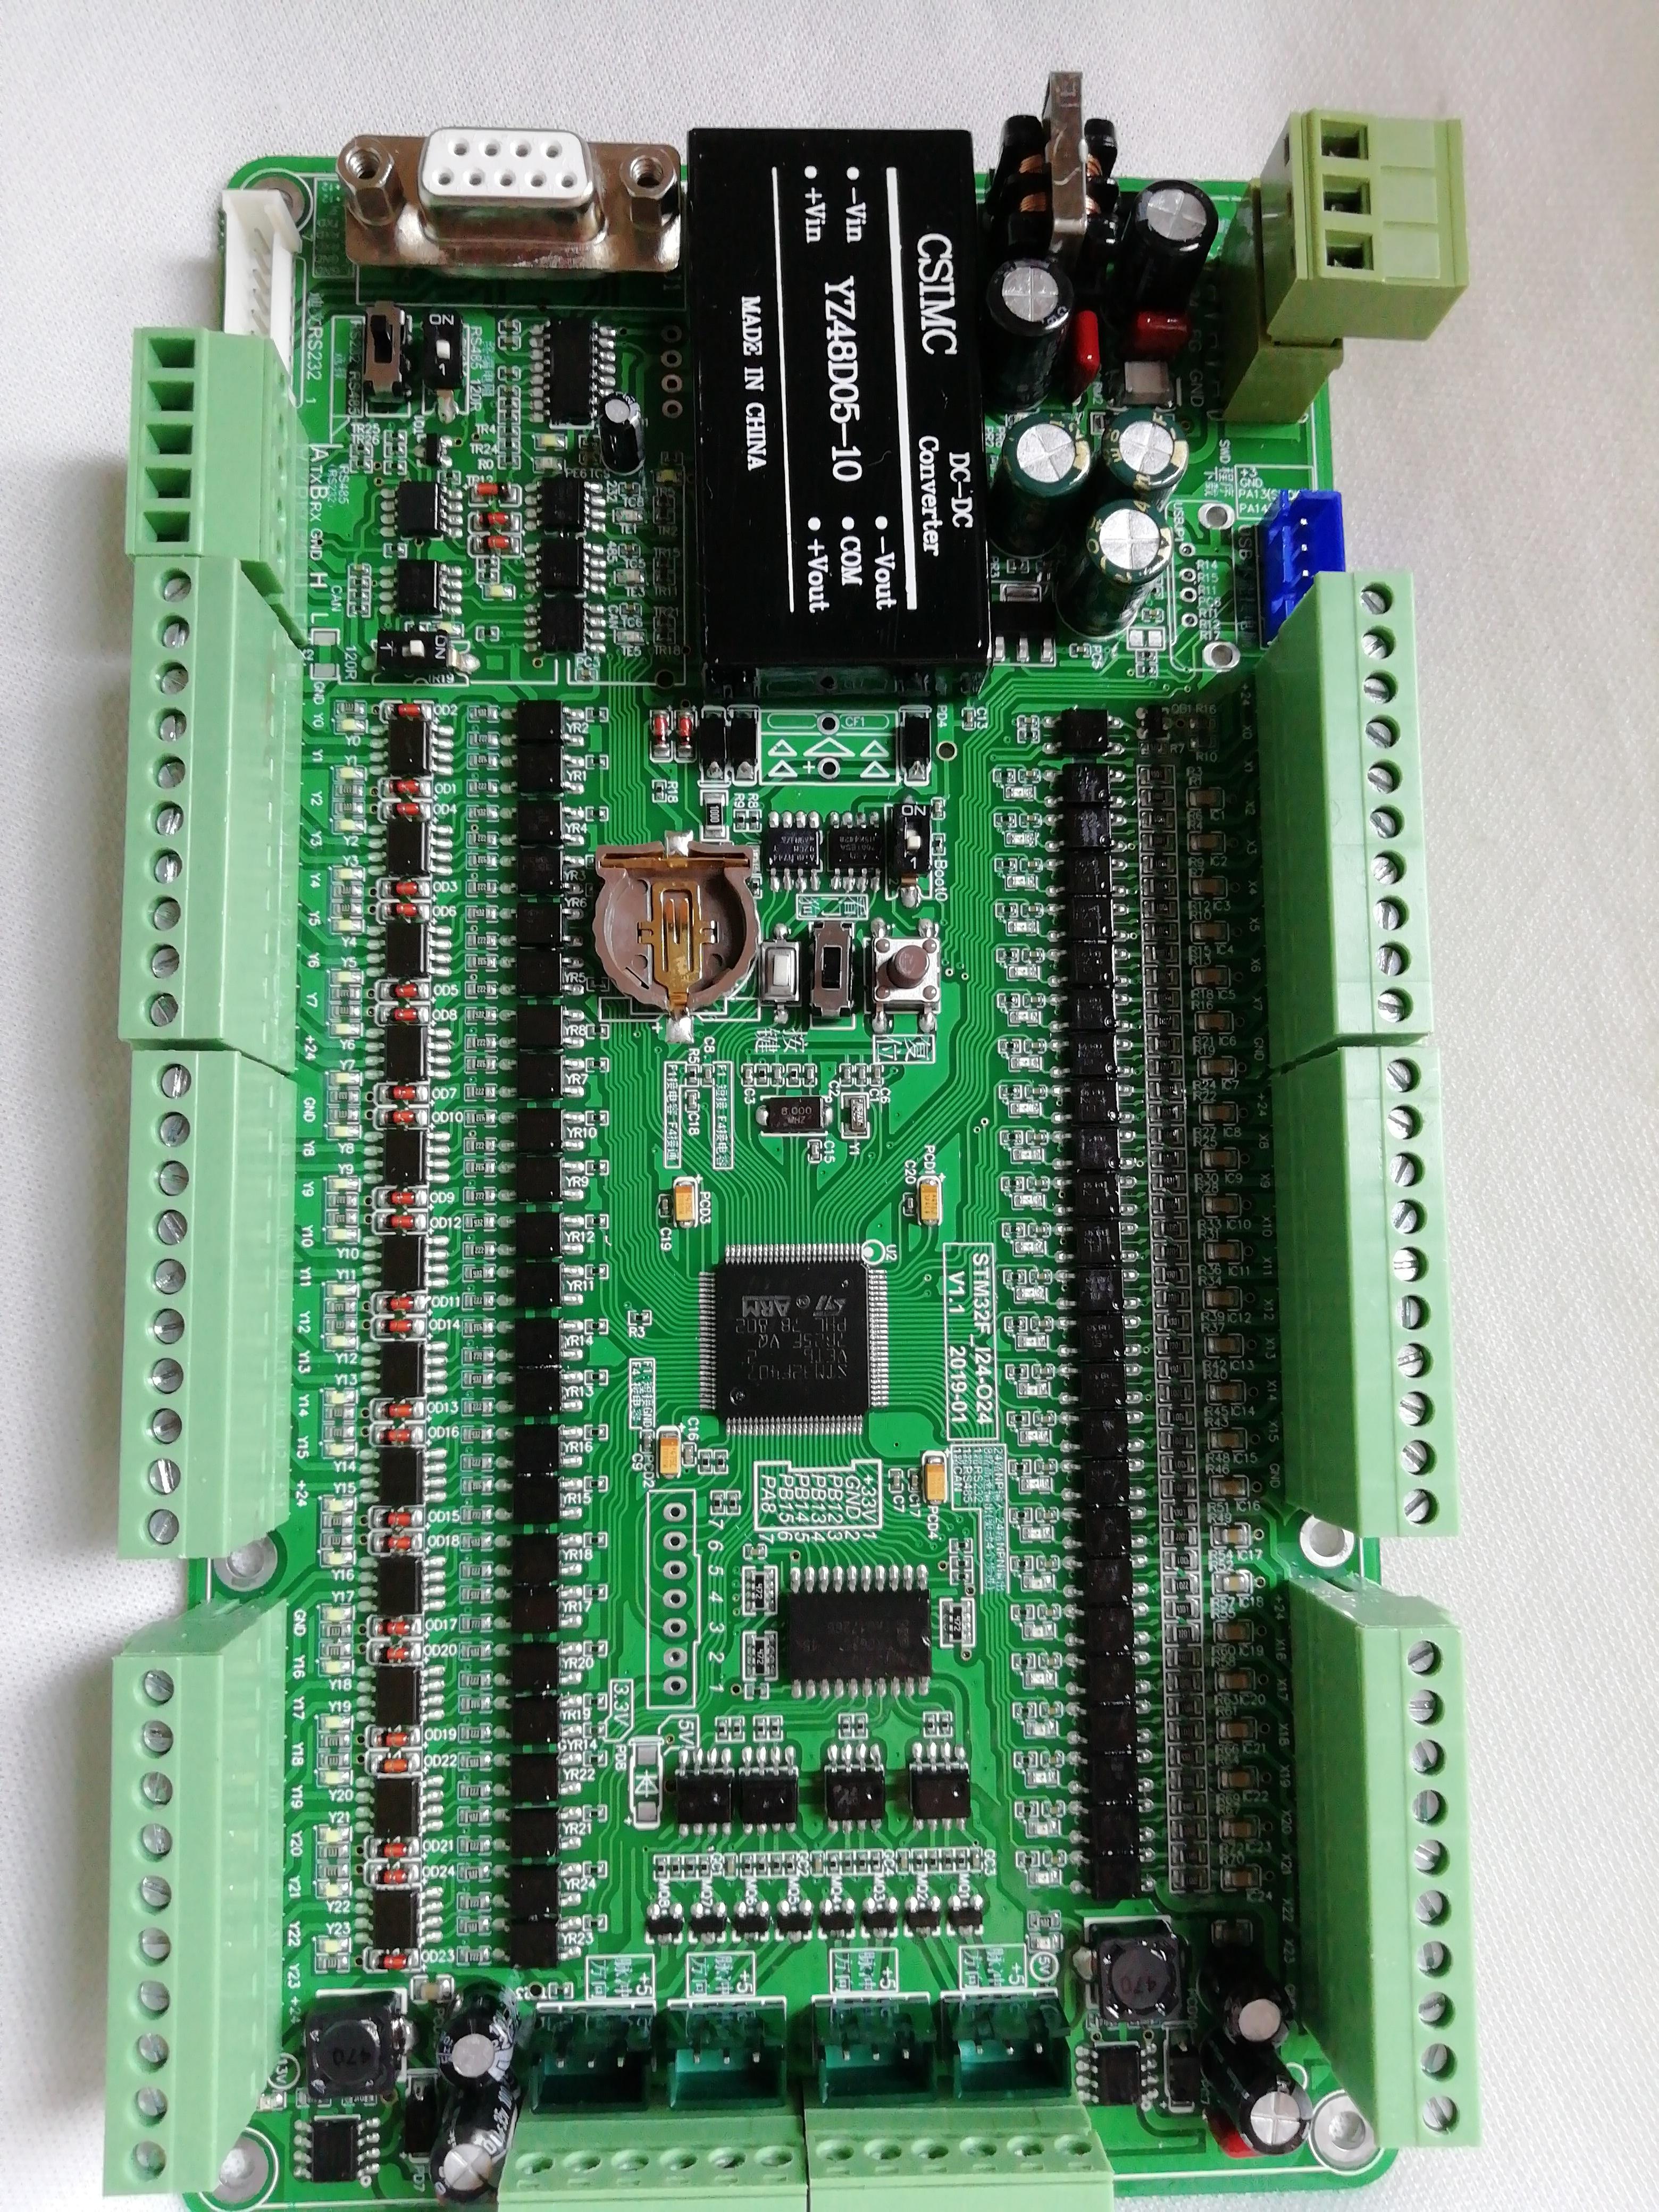 KEIL 520 programación de STM32F103VCT6 tablero de Control Industrial + Control de pulso de Motor de 4 vías RS232 RS485 C programación de lenguaje